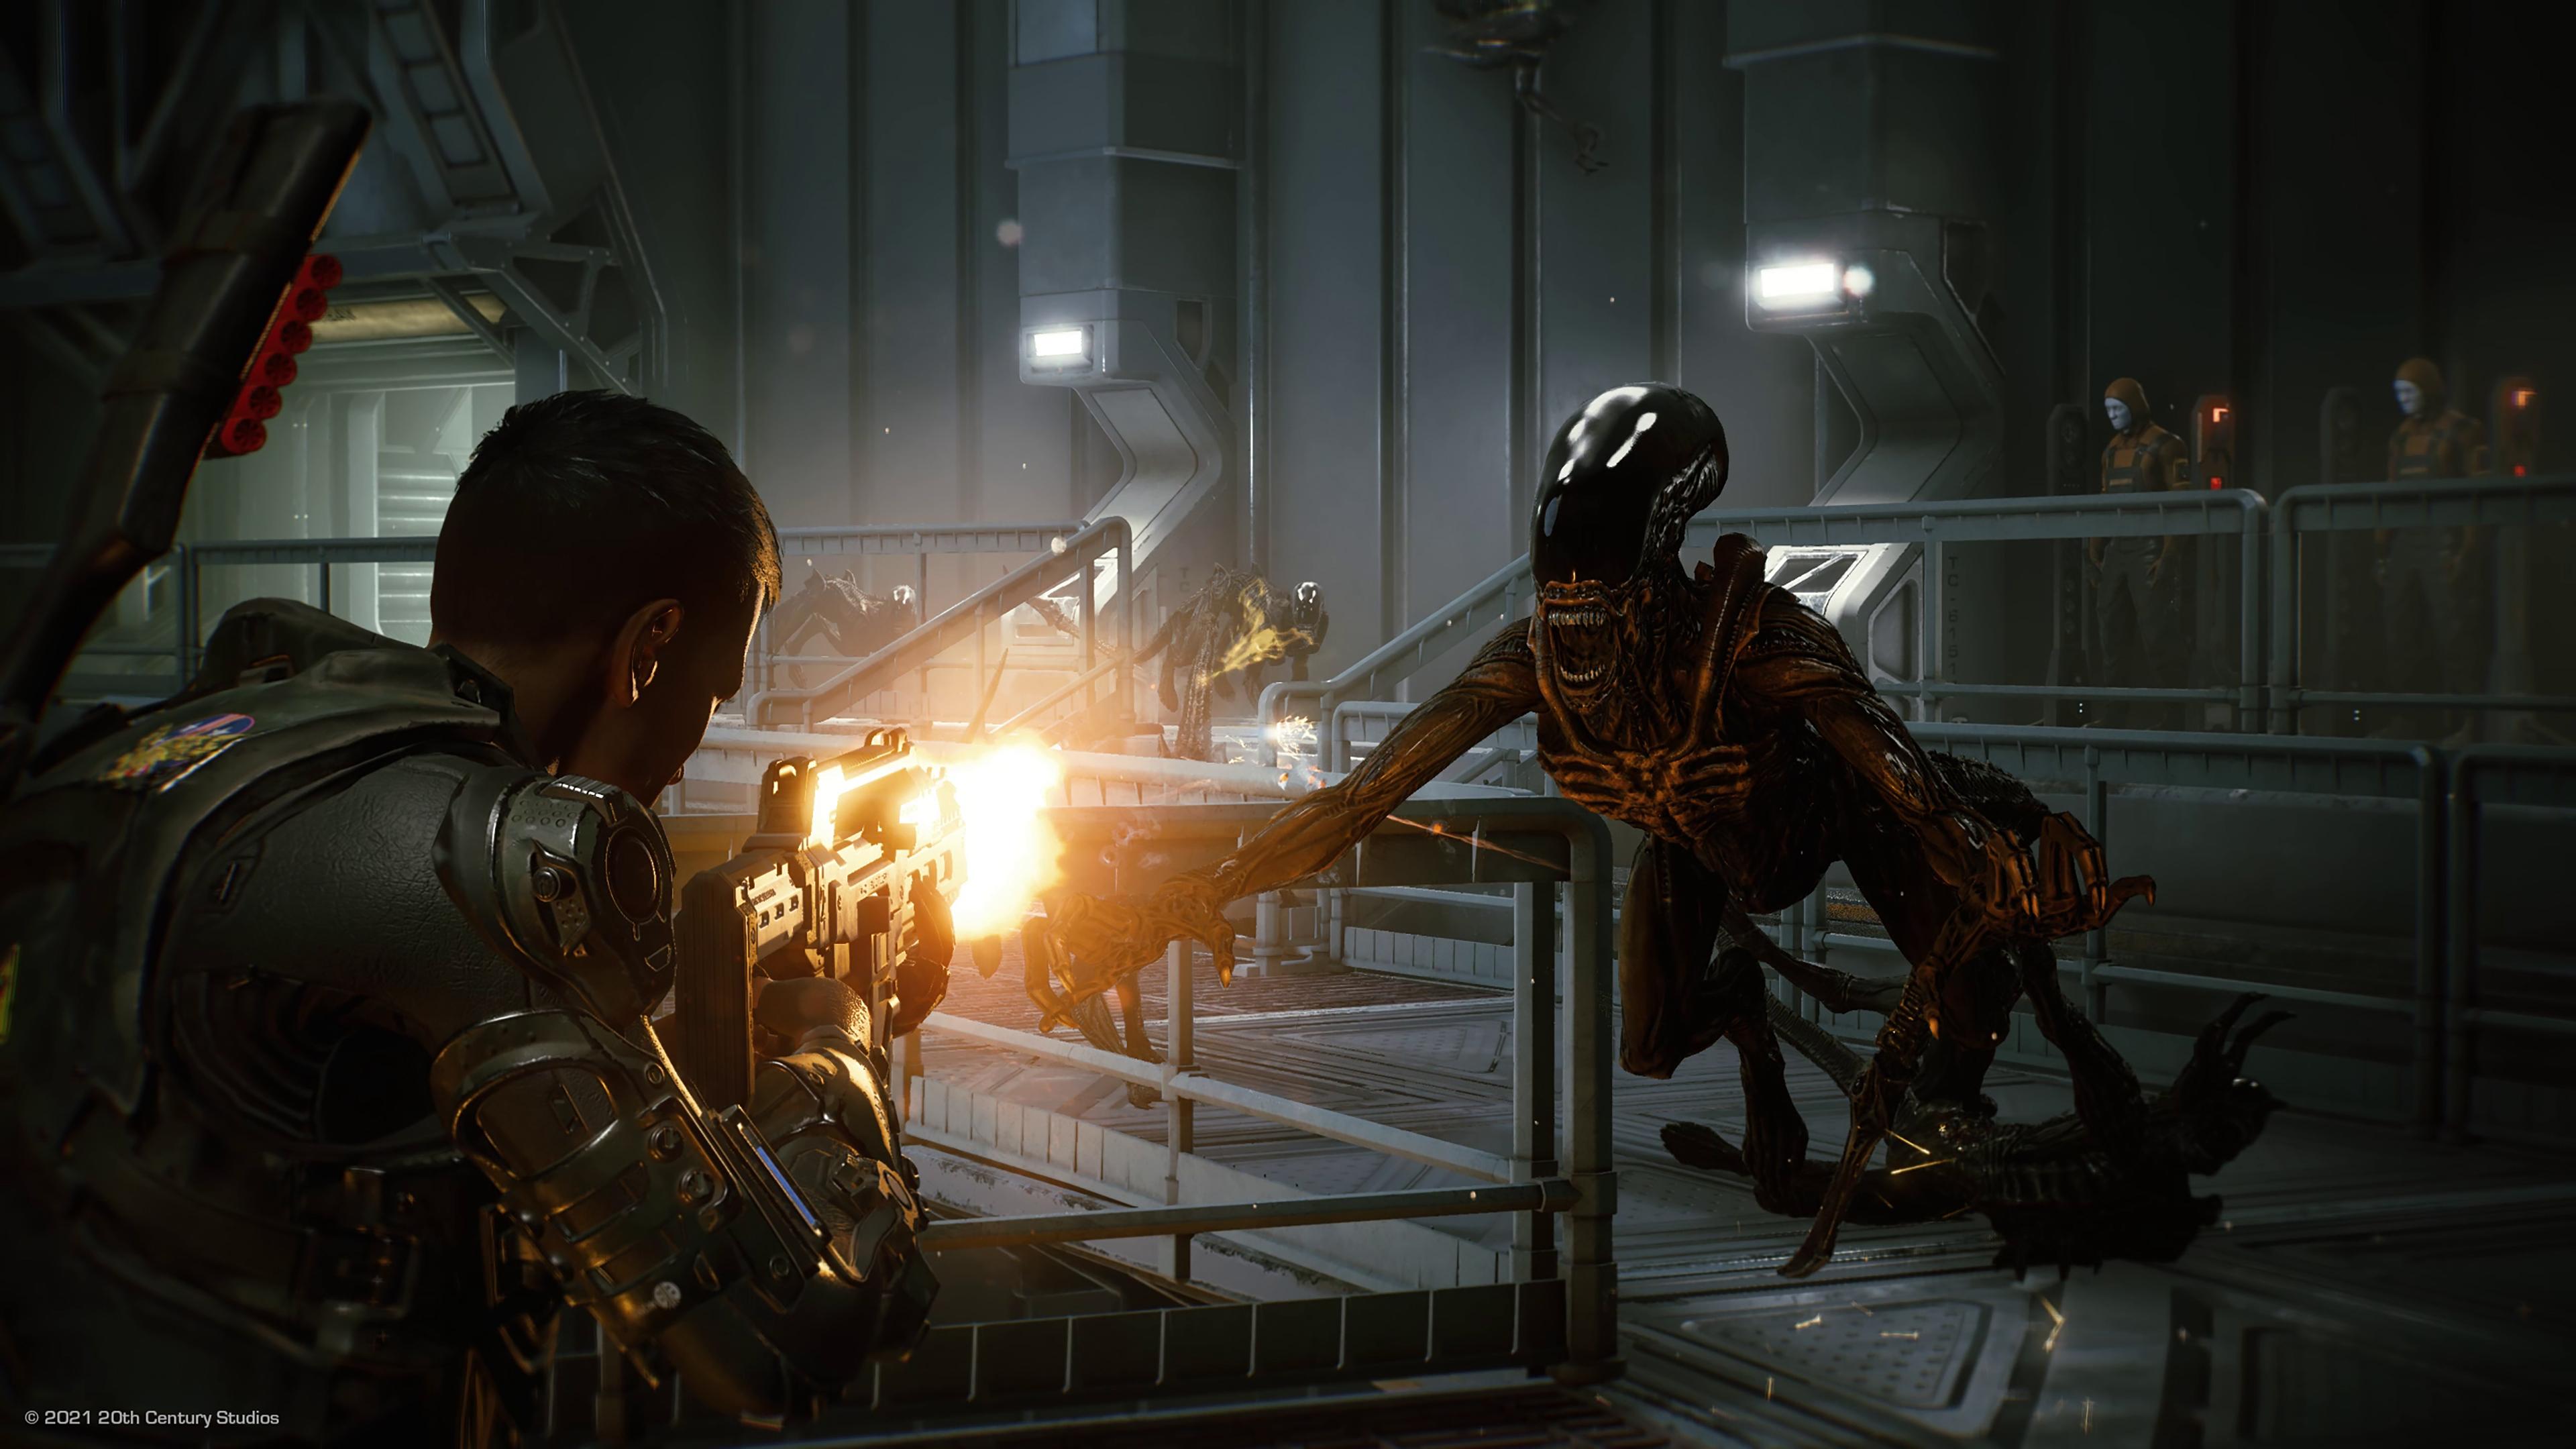 Скриншот №1 к Aliens Fireteam Elite - Deluxe Edition PS4 and PS5